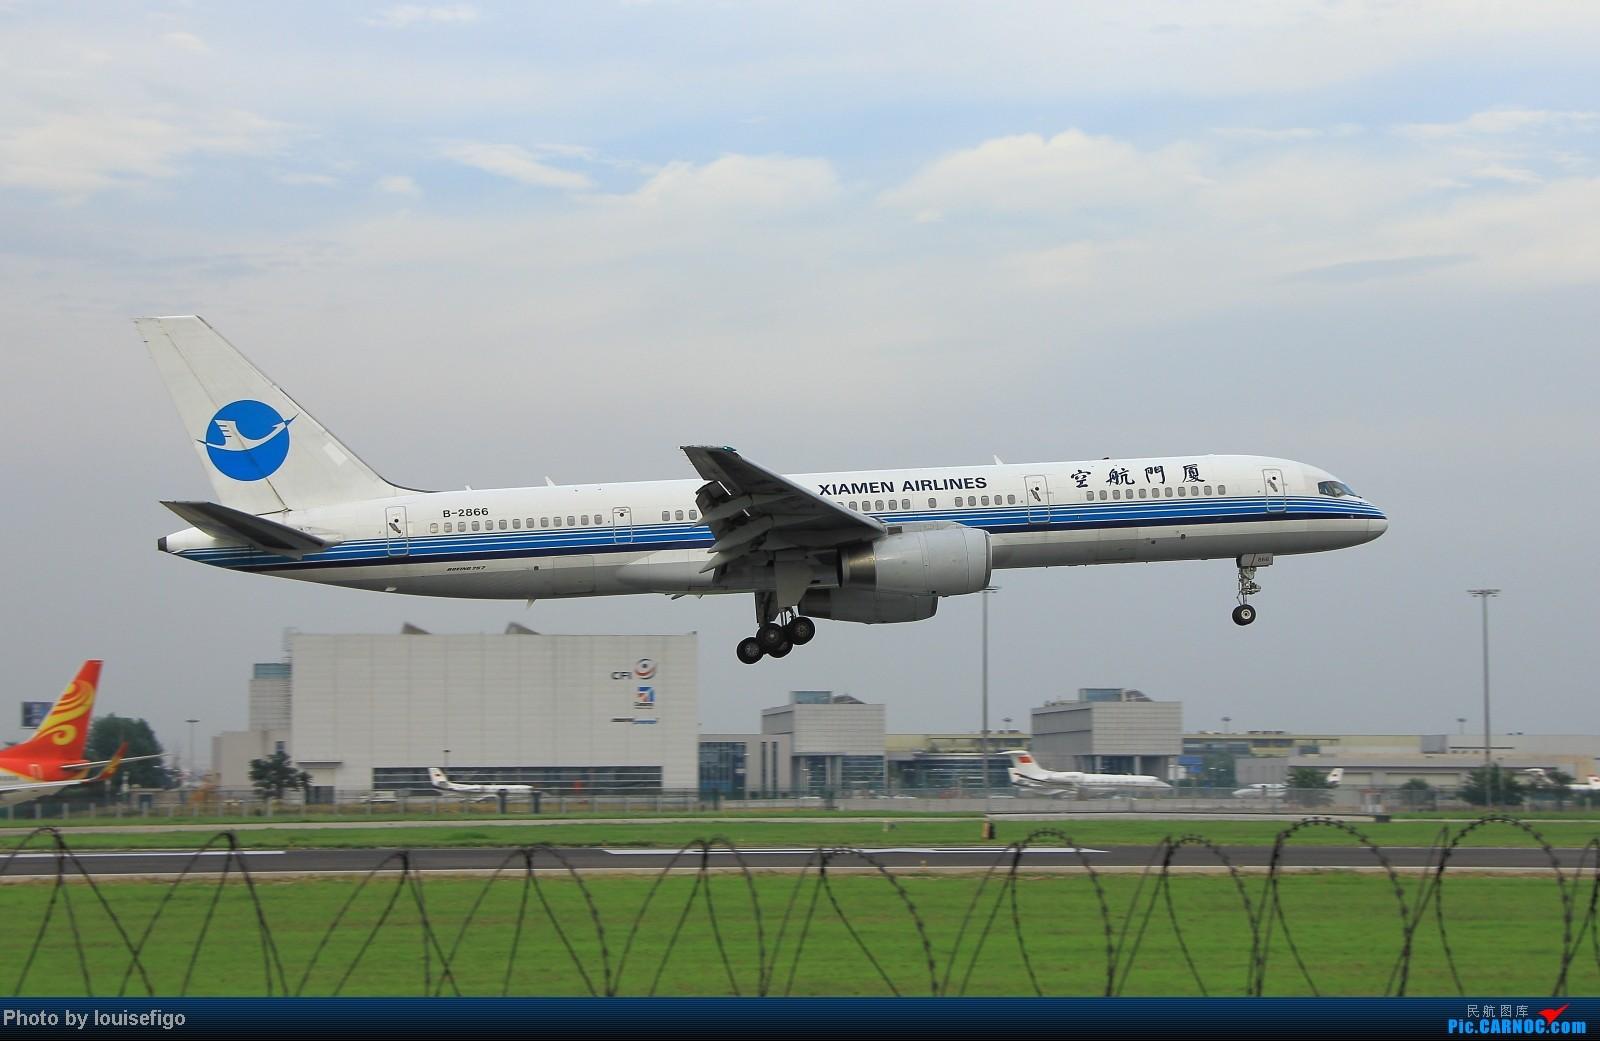 Re:[原创]闲来无事天气闷,发点冷饭自娱乐!!!PEK西跑的降落杂图~发到哪儿是哪儿啊!随心情! BOEING 757-200 B-2866 北京首都国际机场